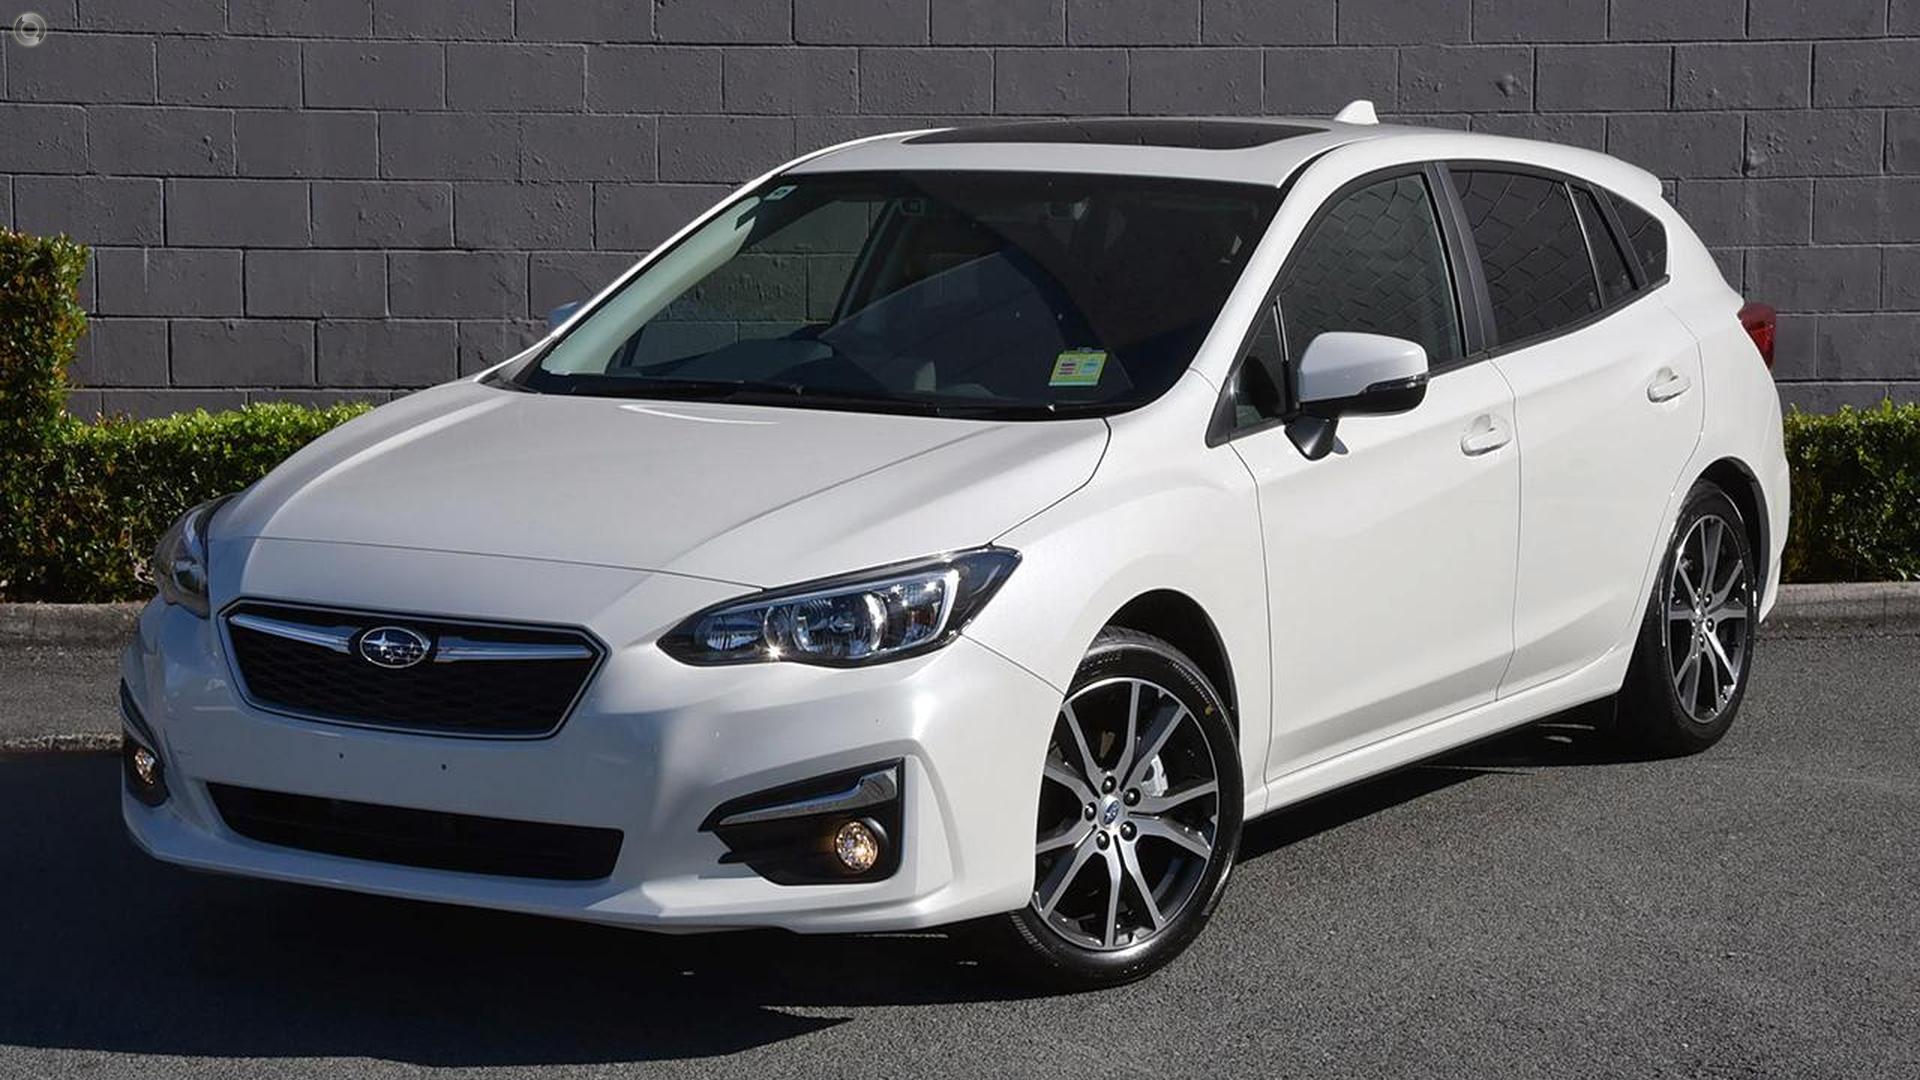 2017 Subaru Impreza G5